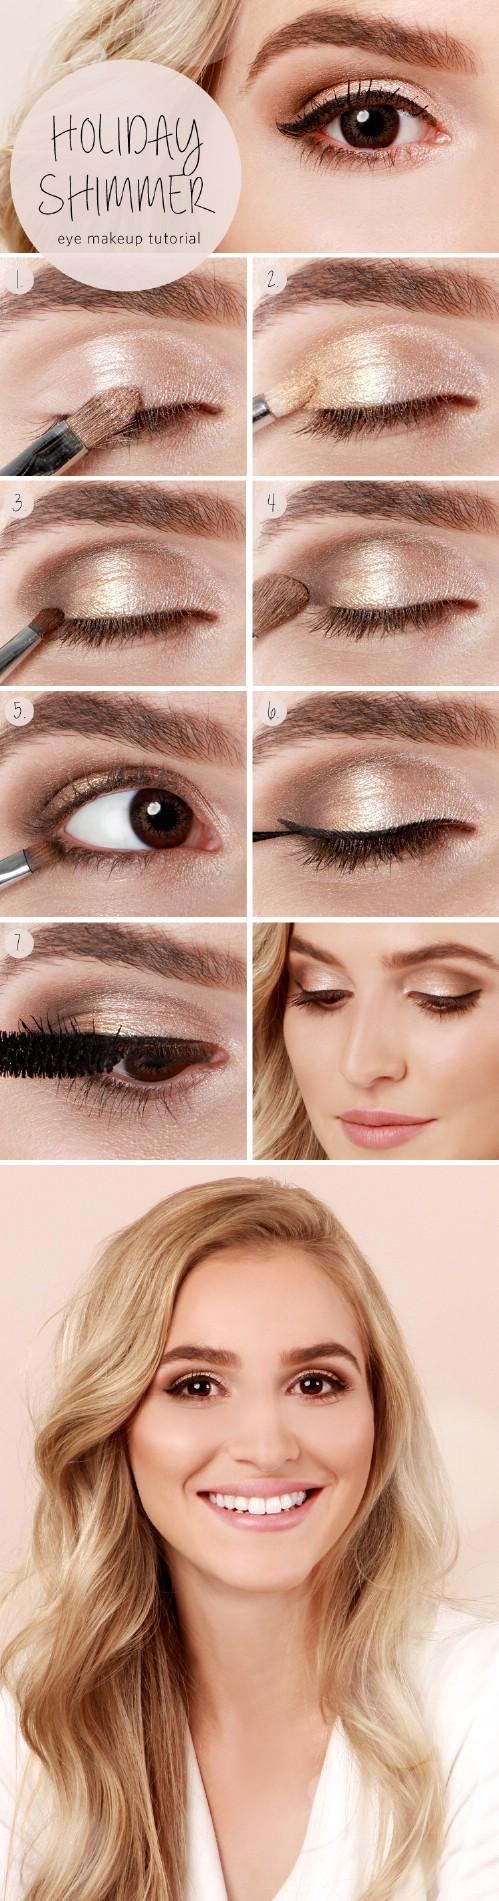 subtle shimmer 10 stylishly festive christmas makeup ideas